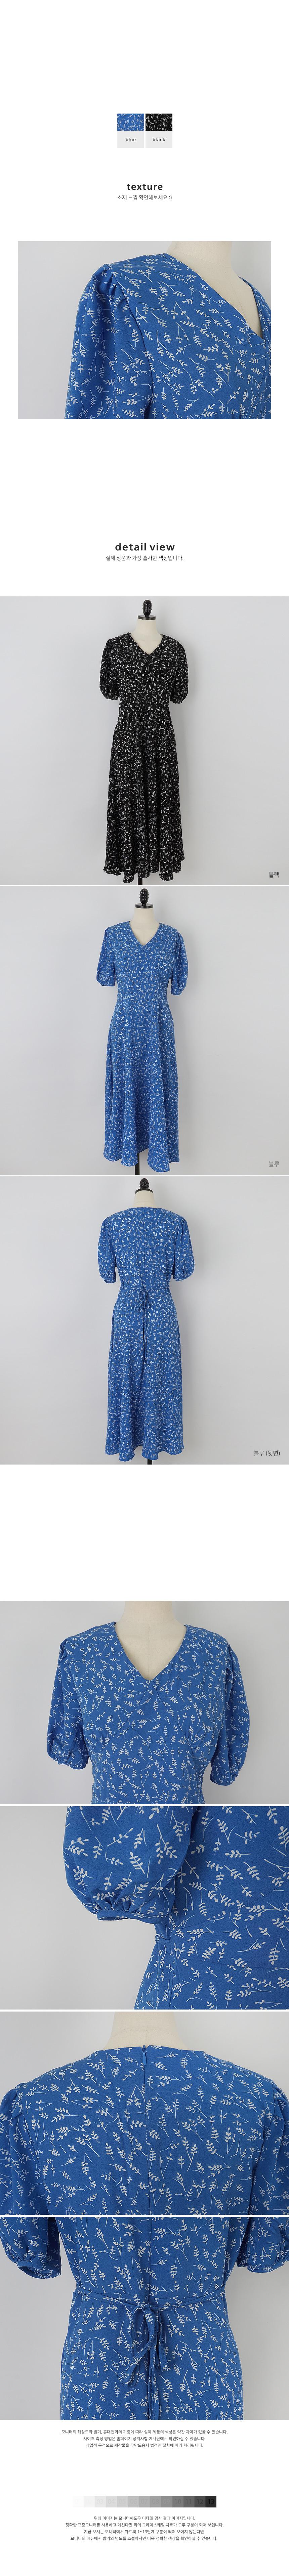 Rone printing Dress